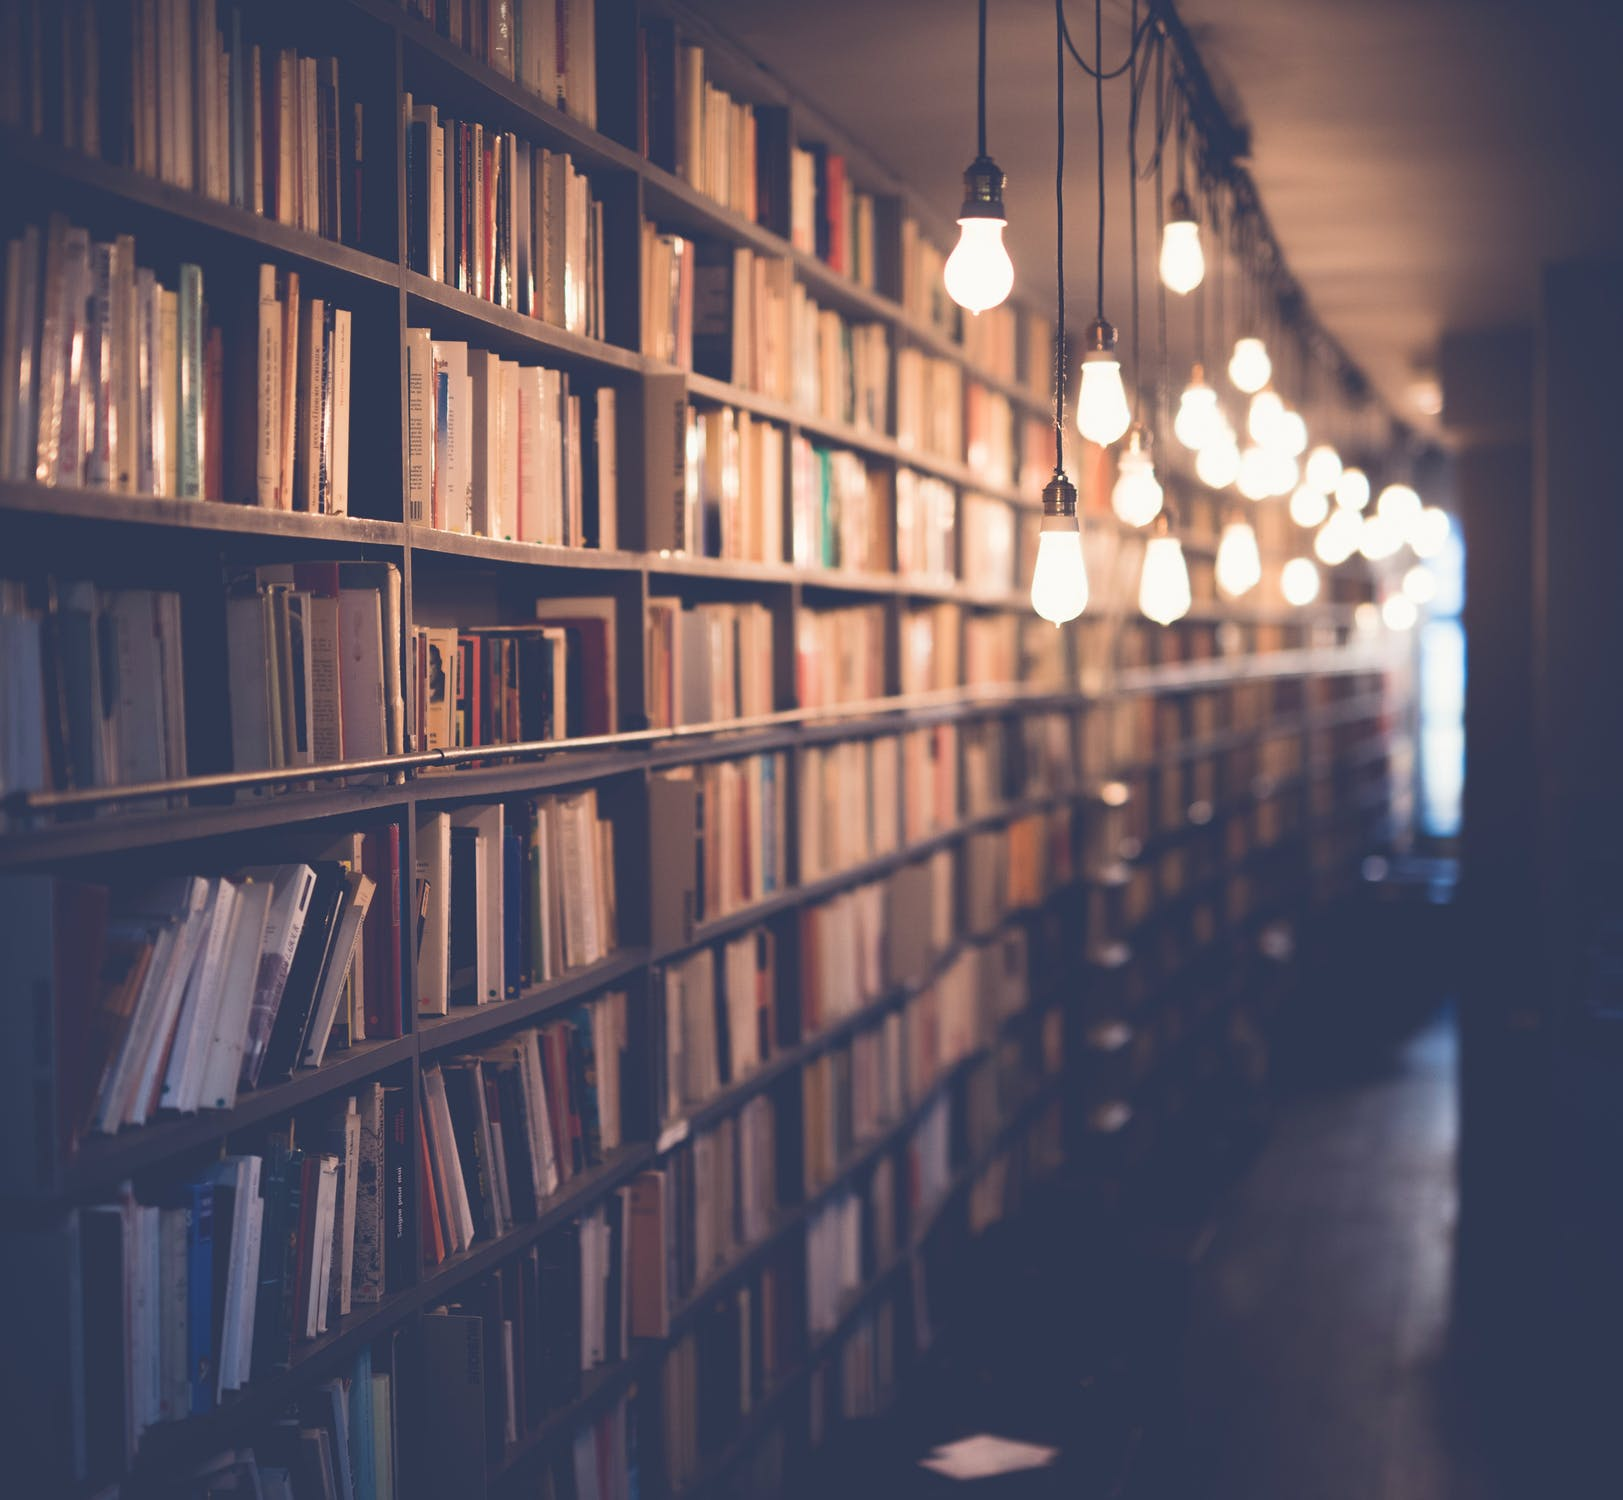 Library Shelves pexels-photo-590493.jpeg Janko Ferlic